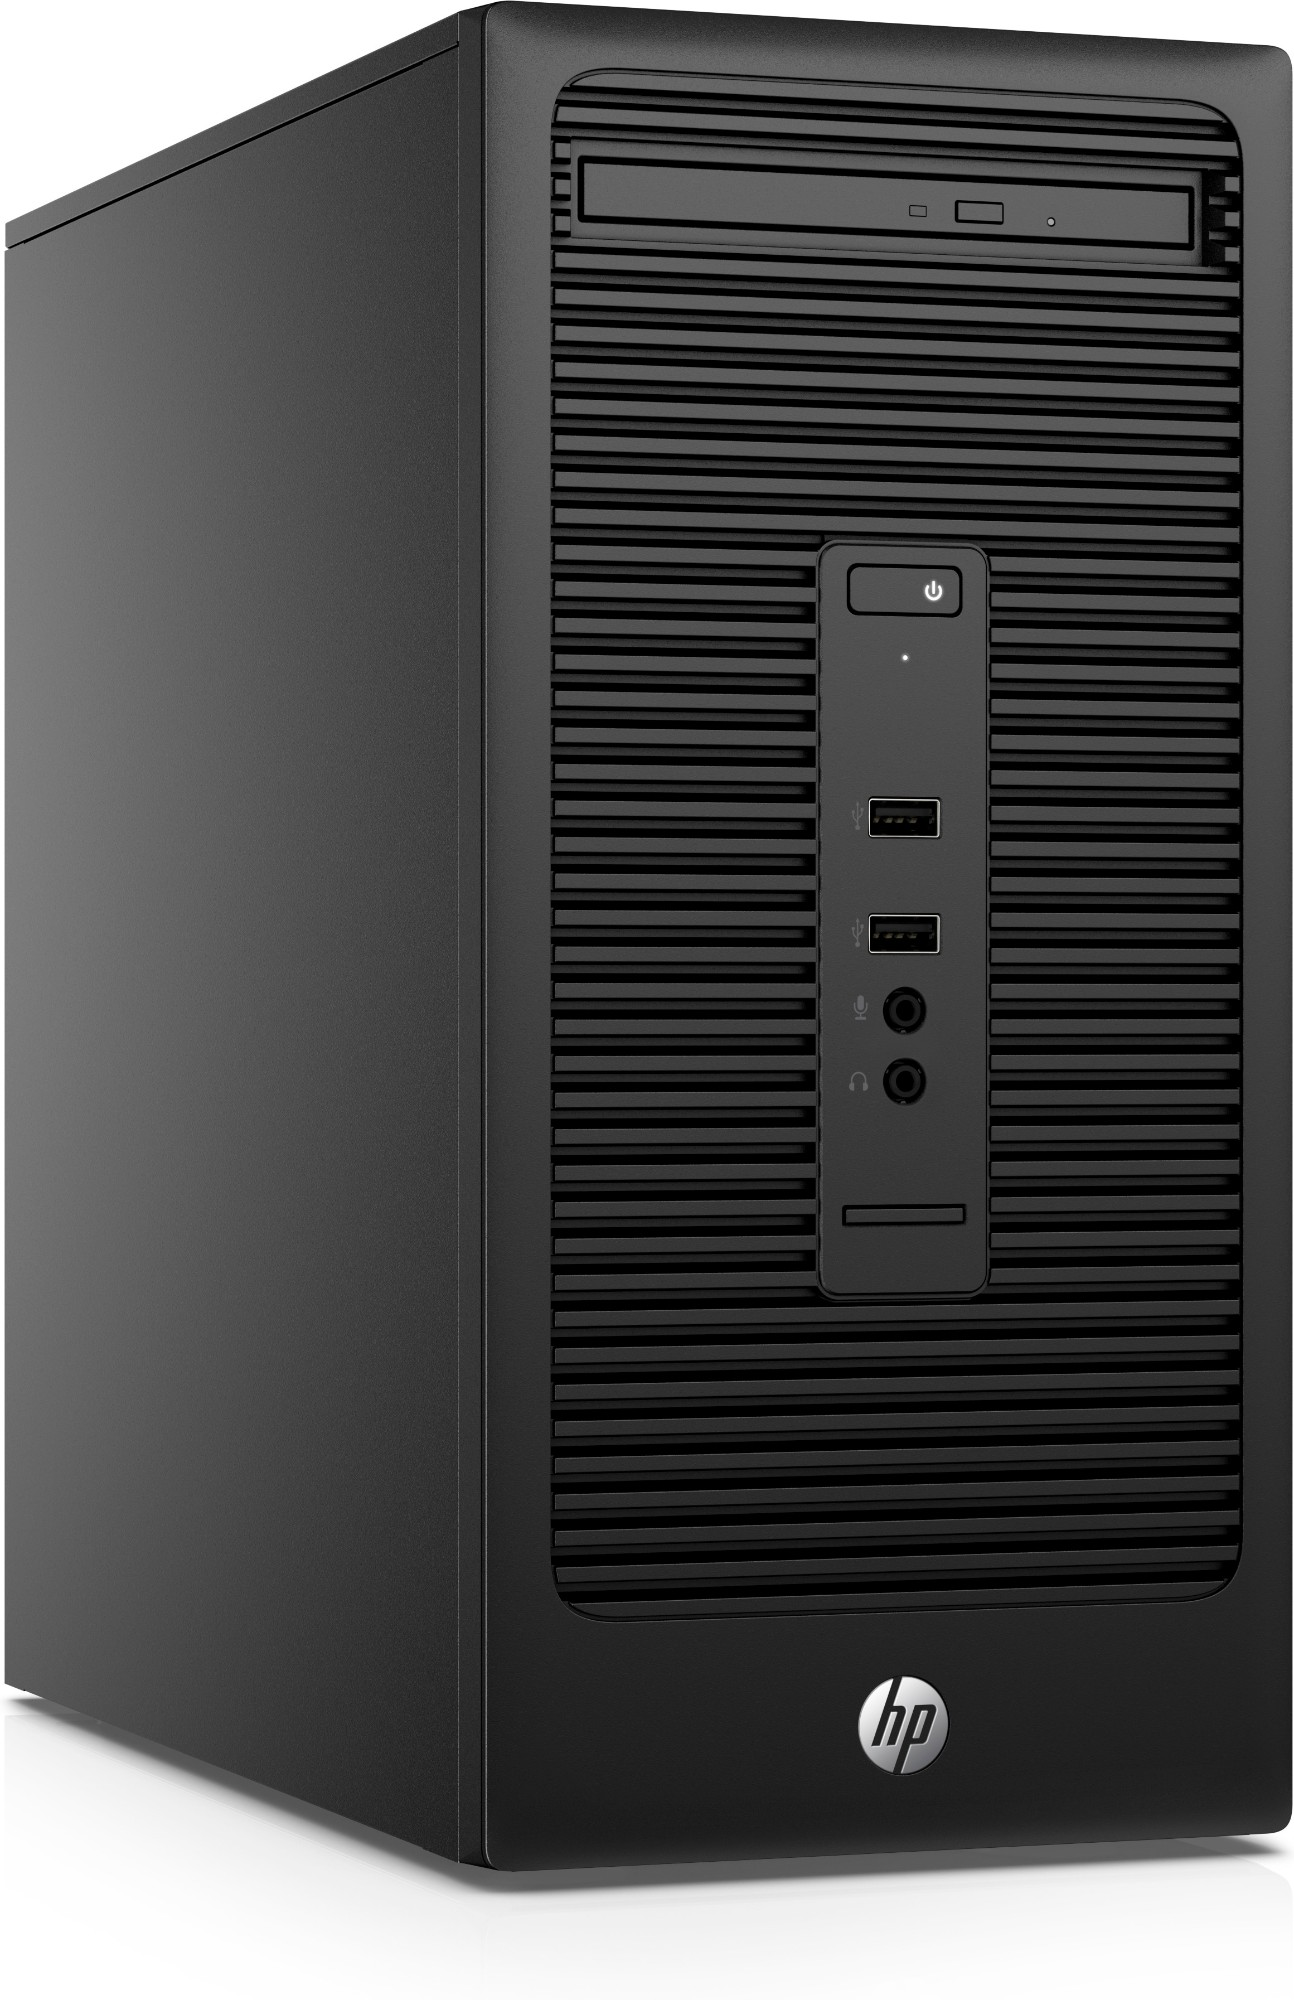 HP Pro A AMD Ryzen 5 PRO 2400G 4 GB DDR4-SDRAM 1000 GB HDD Black Micro  Tower PC